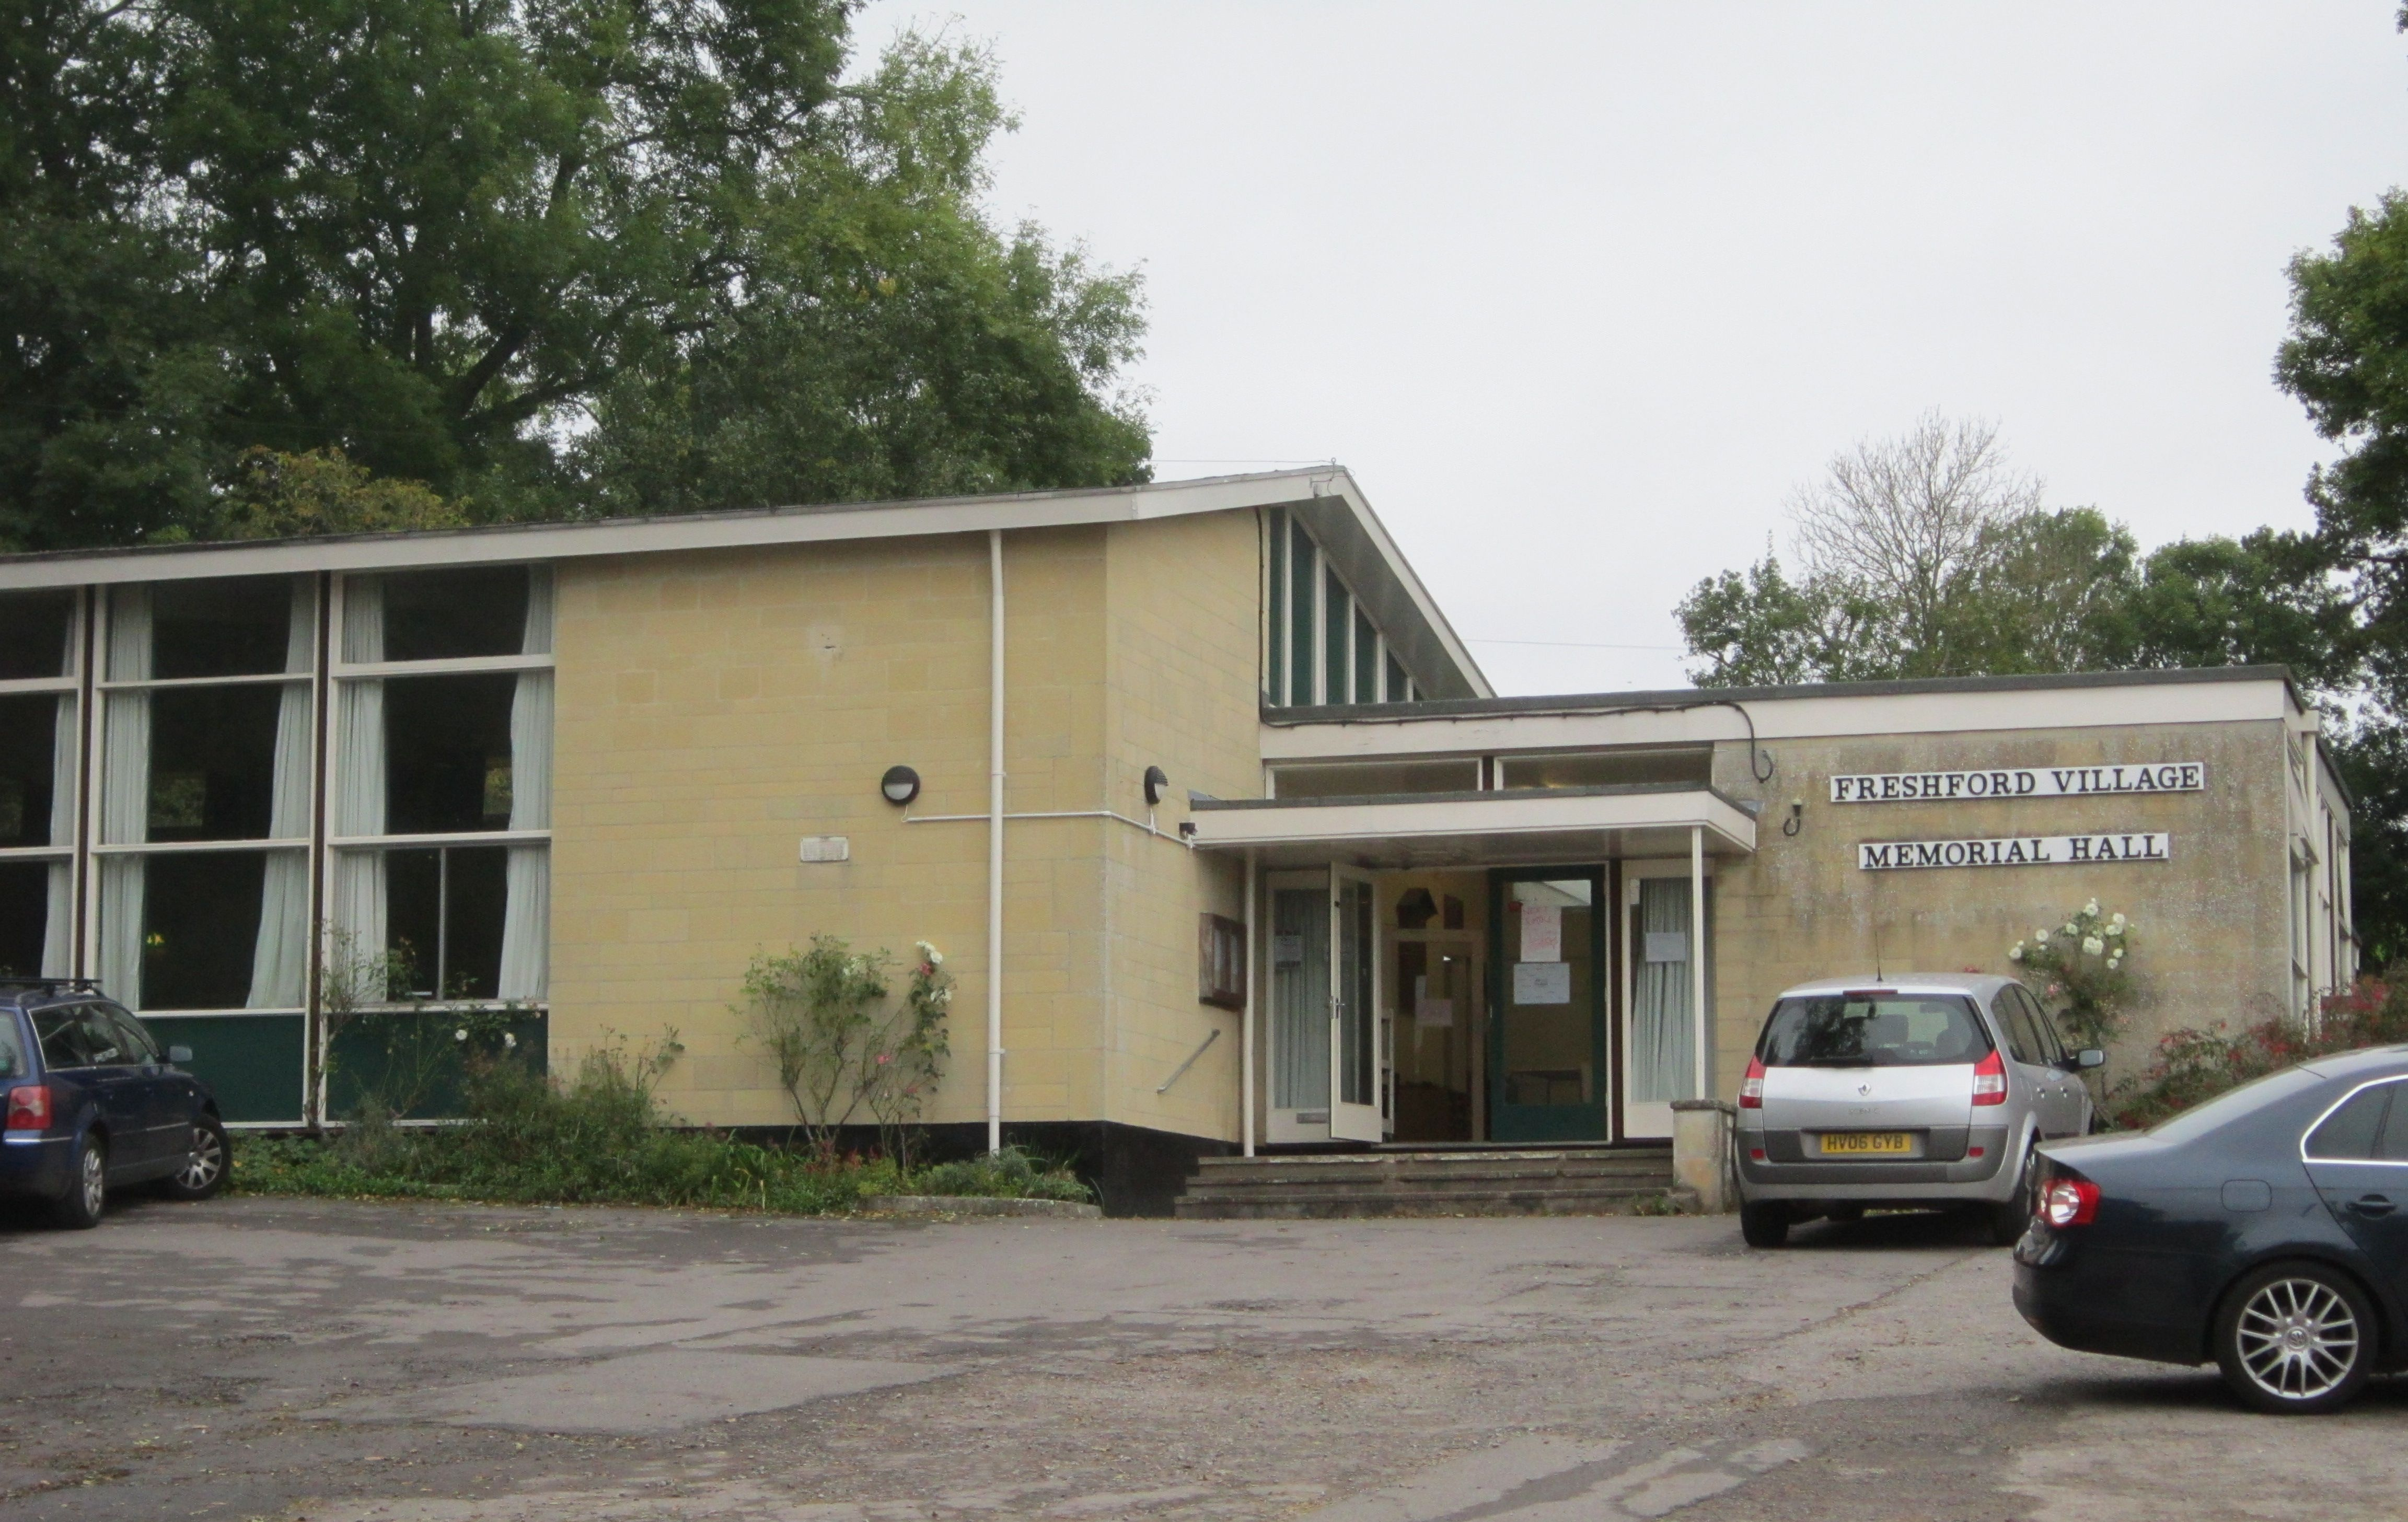 File:Freshford village hall JPG - Wikimedia Commons